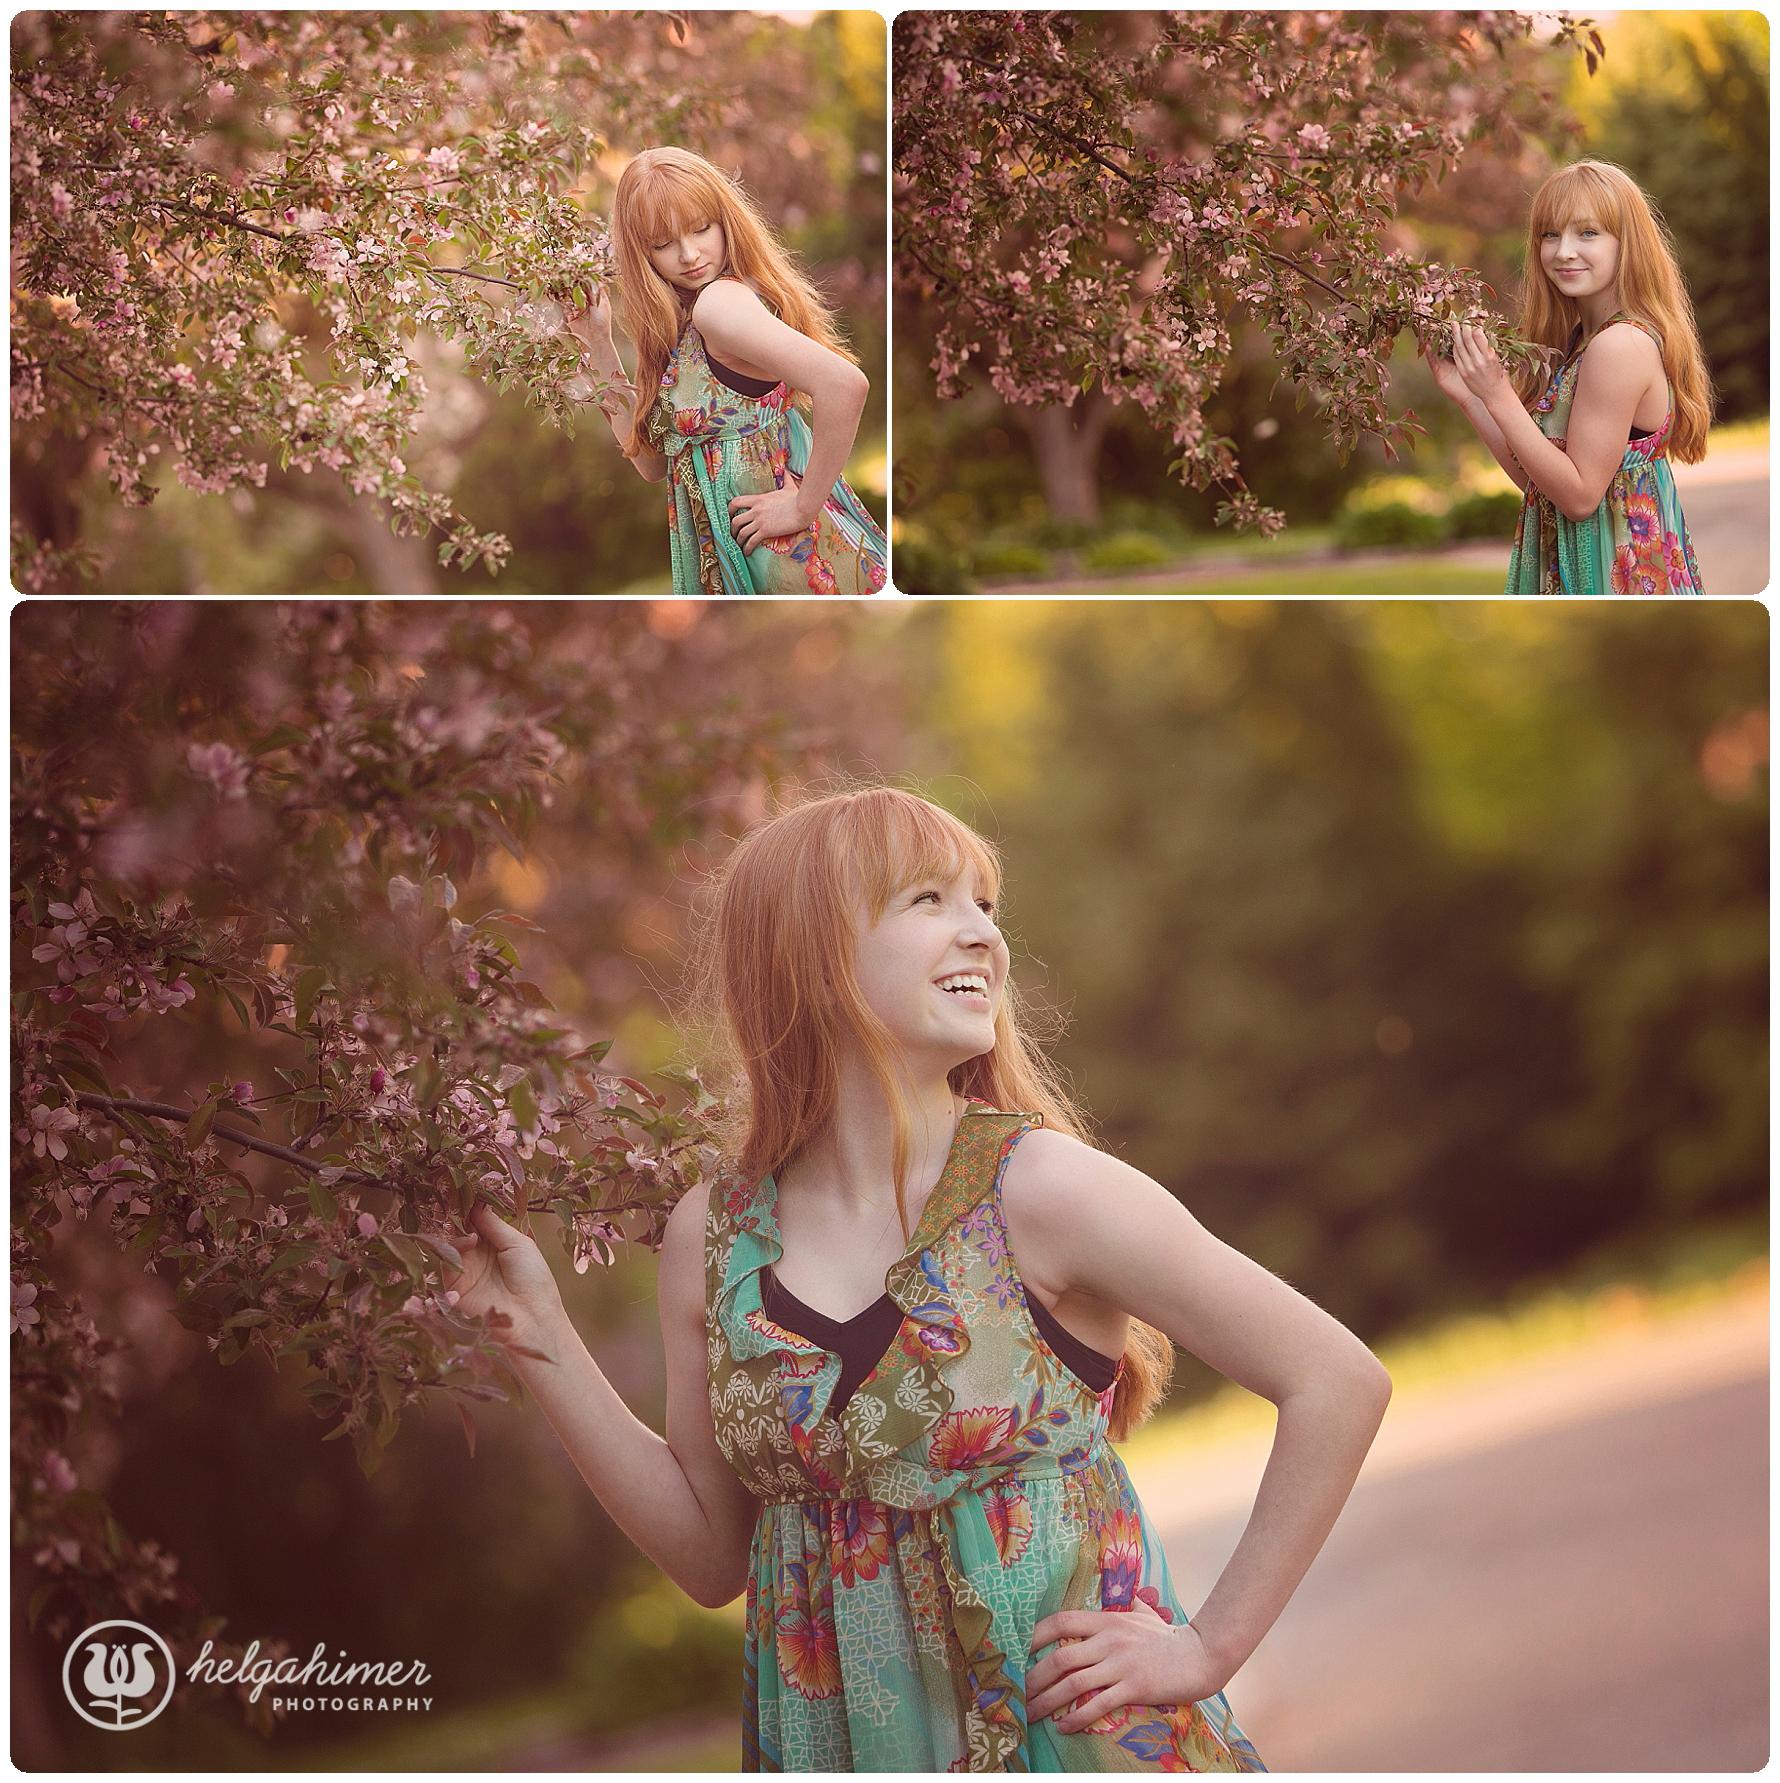 er-photography-apple-blossom-summer-sudbury-professional-photographer-personal-branding-cherry-blossom-senior-photo-girl-model